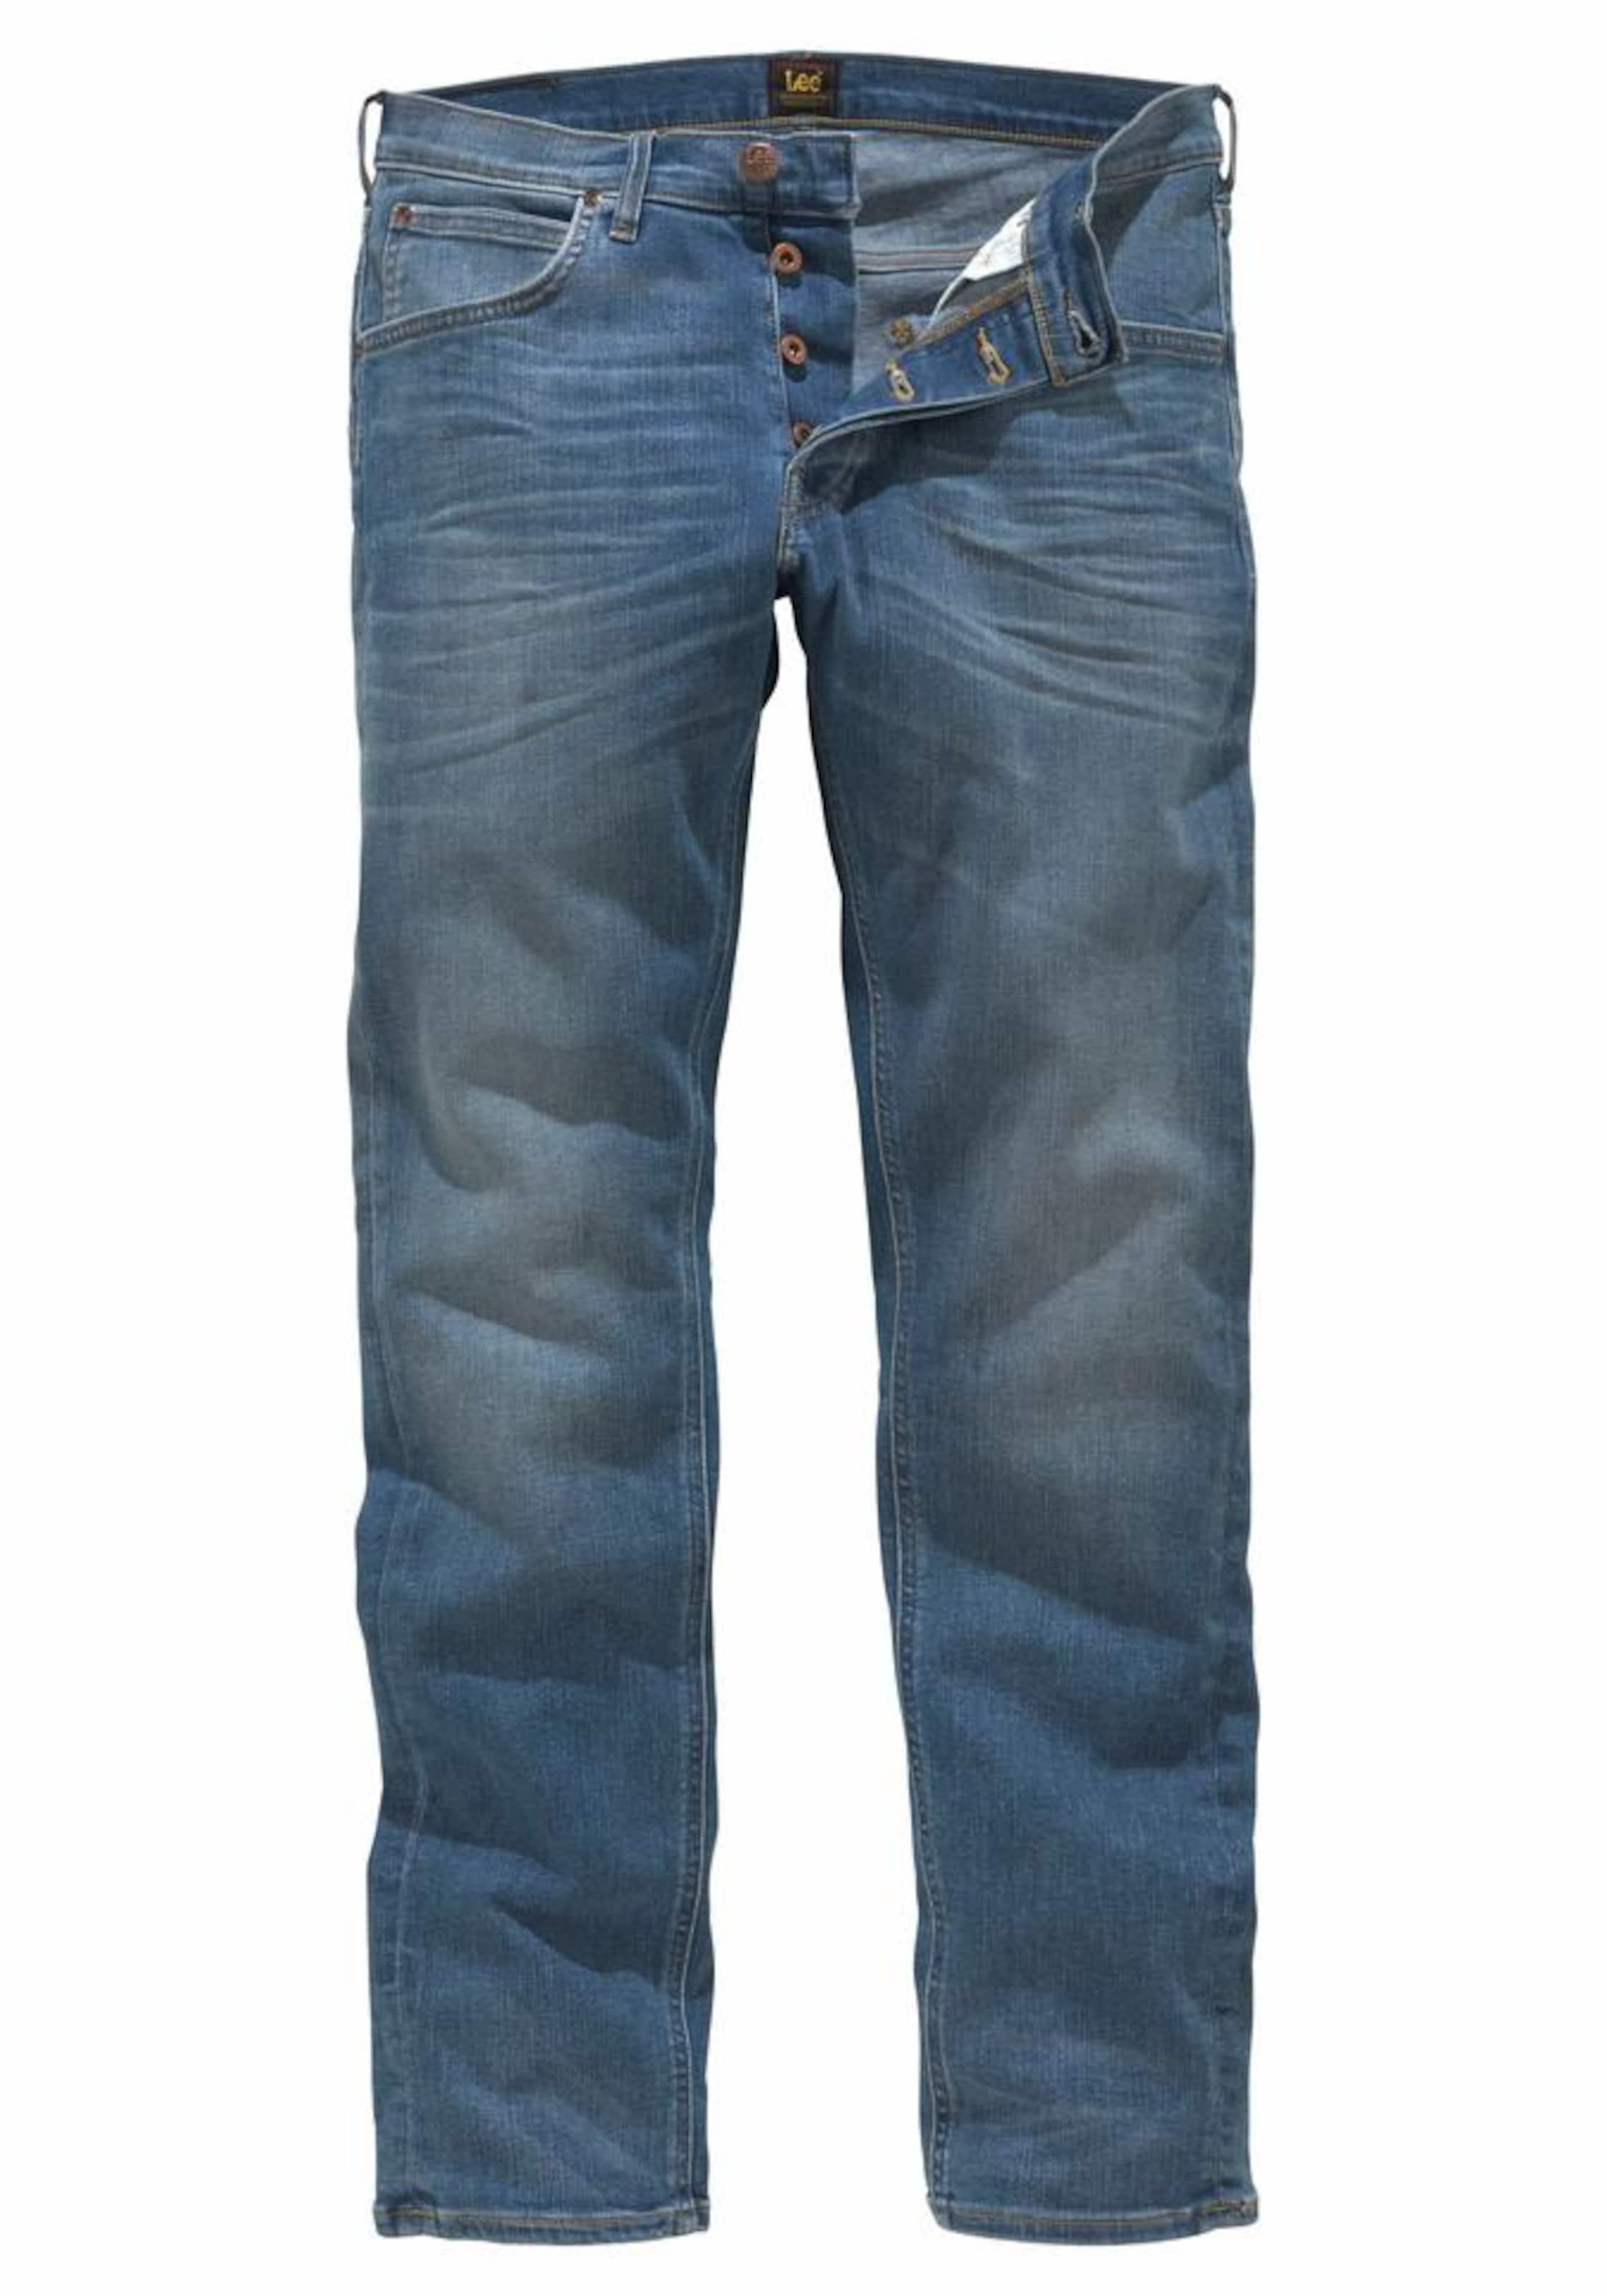 Auslass Original Lee Straight Leg Jeans 'Daren' Billig Verkauf 100% Original Wahl ZG1TJc68p